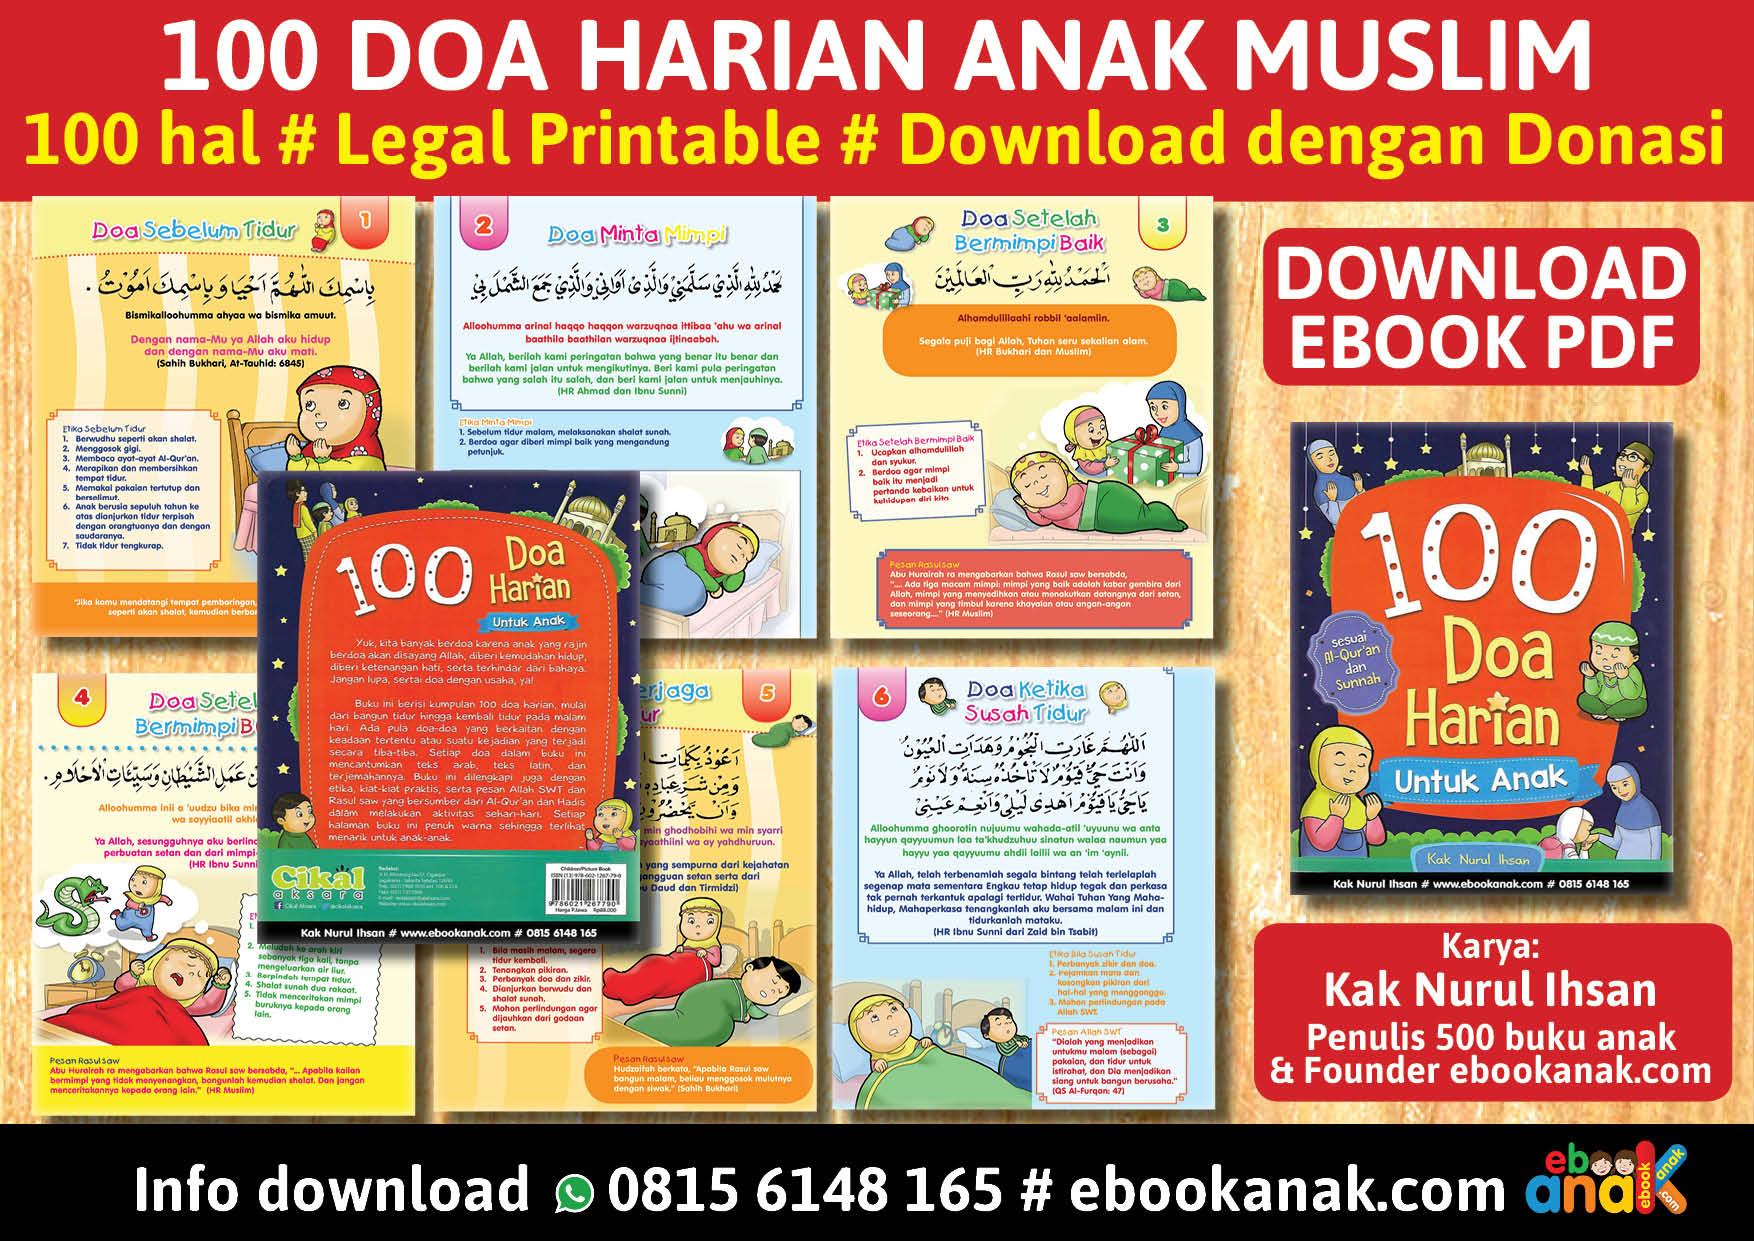 baner 100 doa harian anak muslim